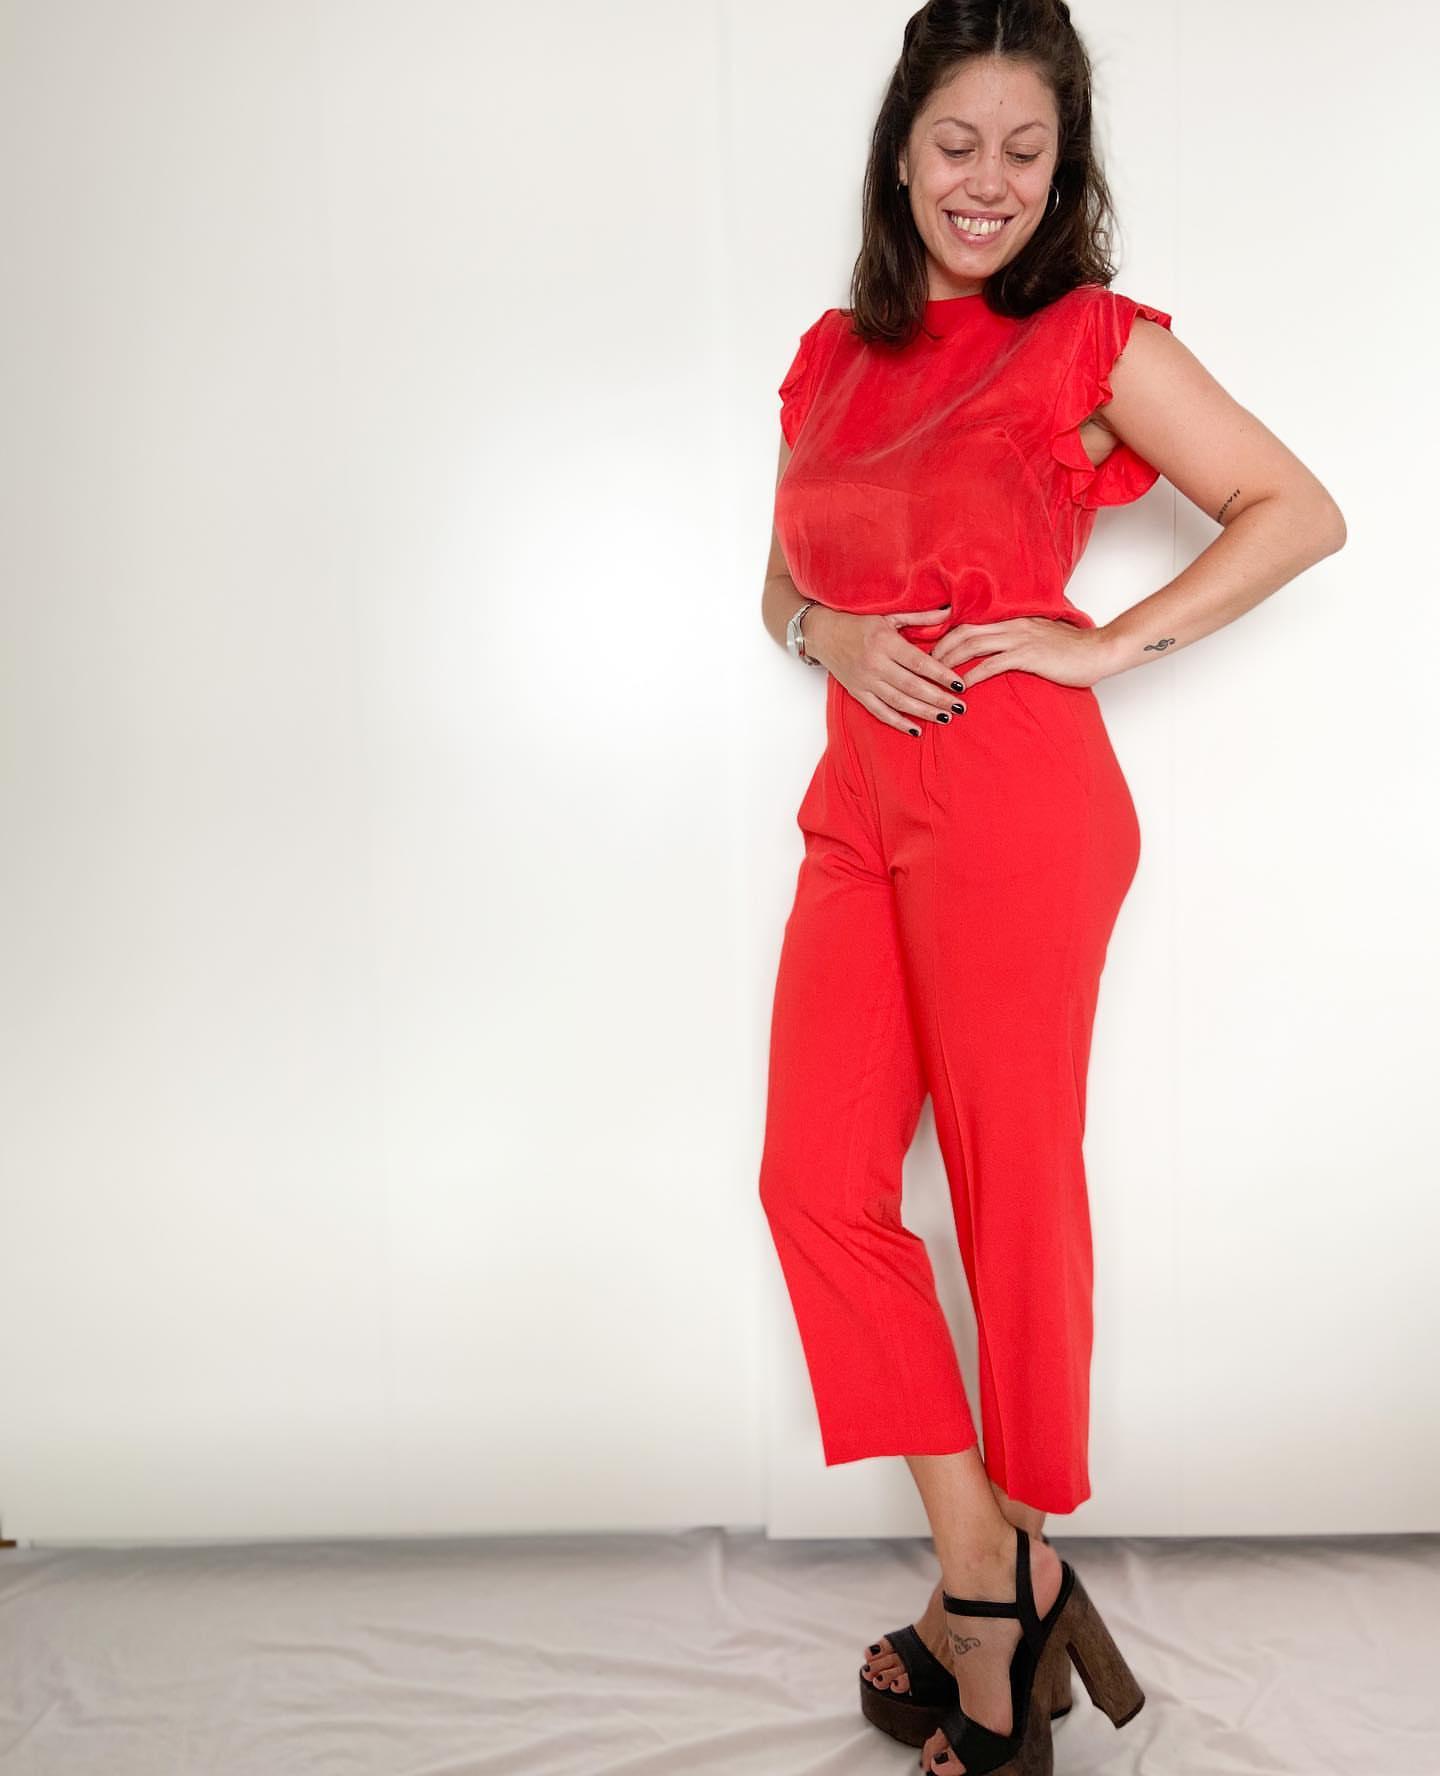 tuti.tieppo 1592064924 3 - Cómo encontrar nuestro estilo personal - Valeria Berrini